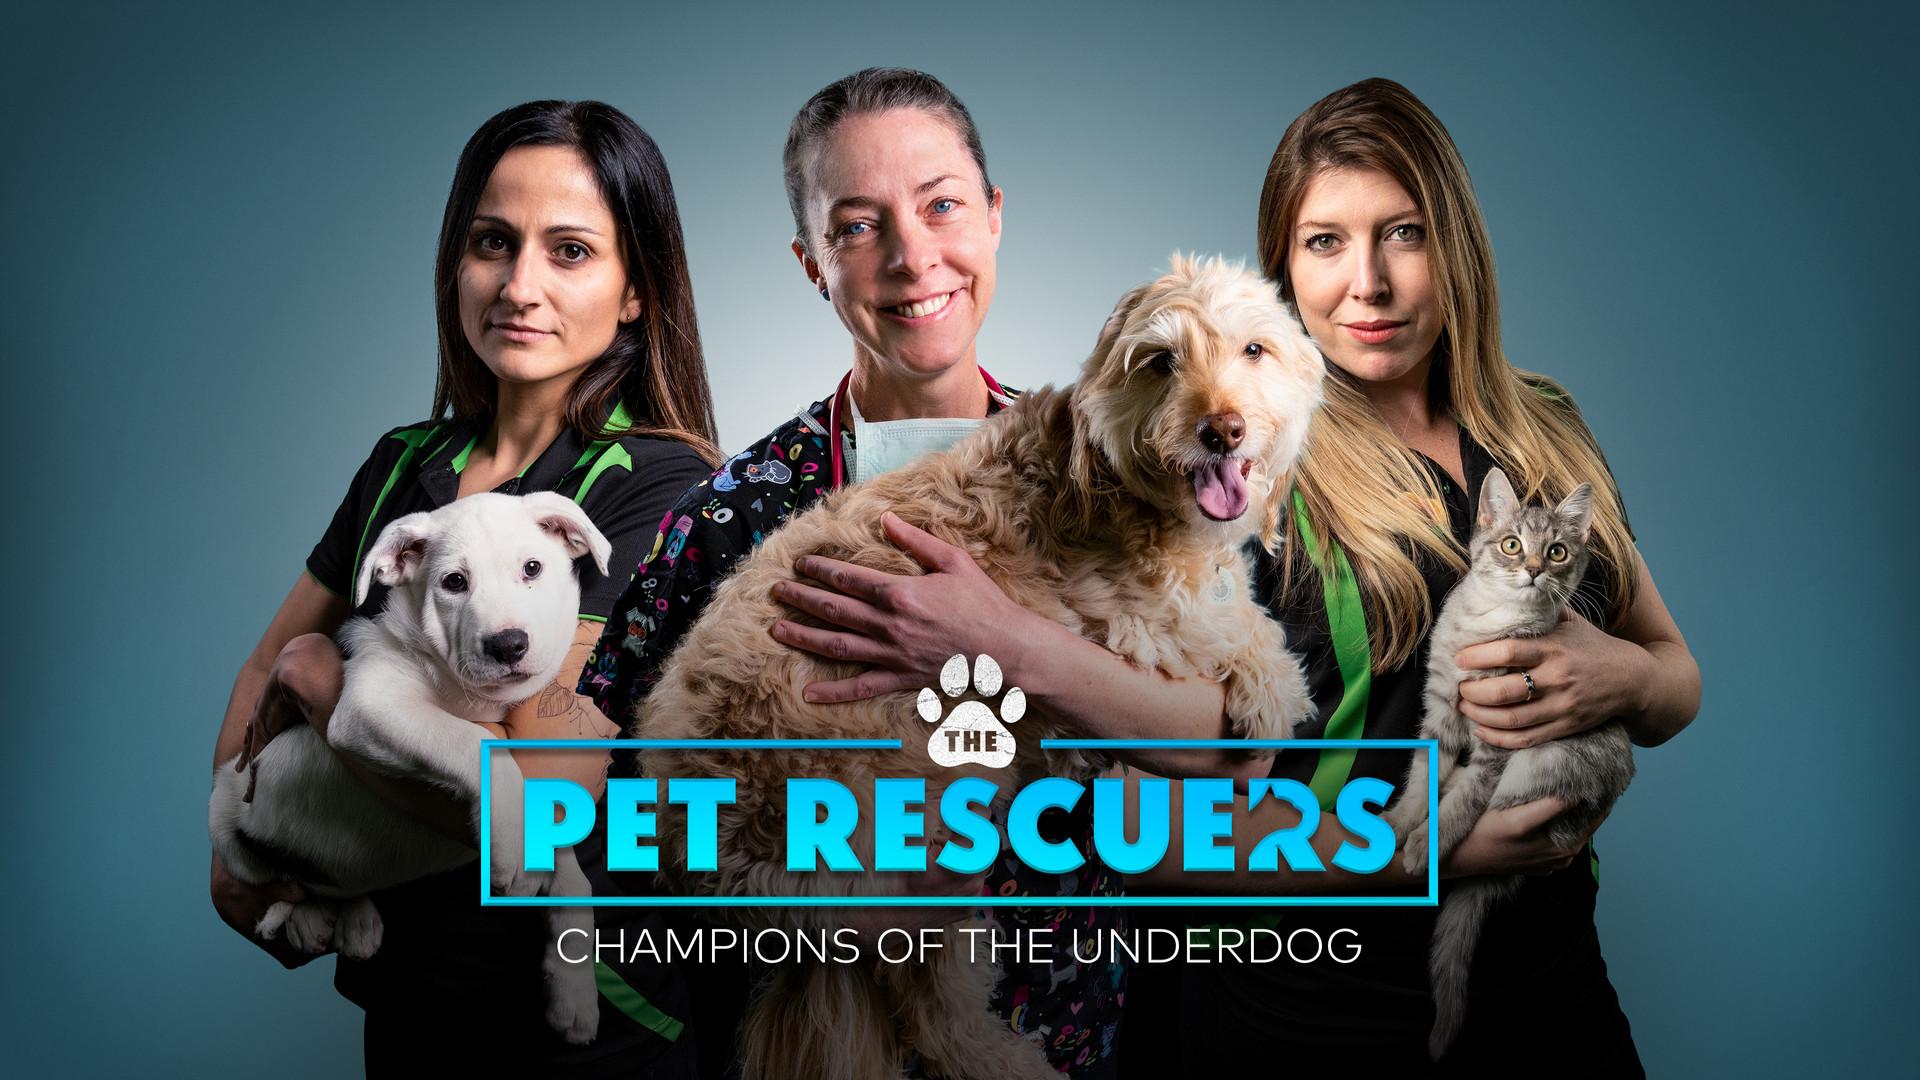 The Pet Rescuers (10 x 30')